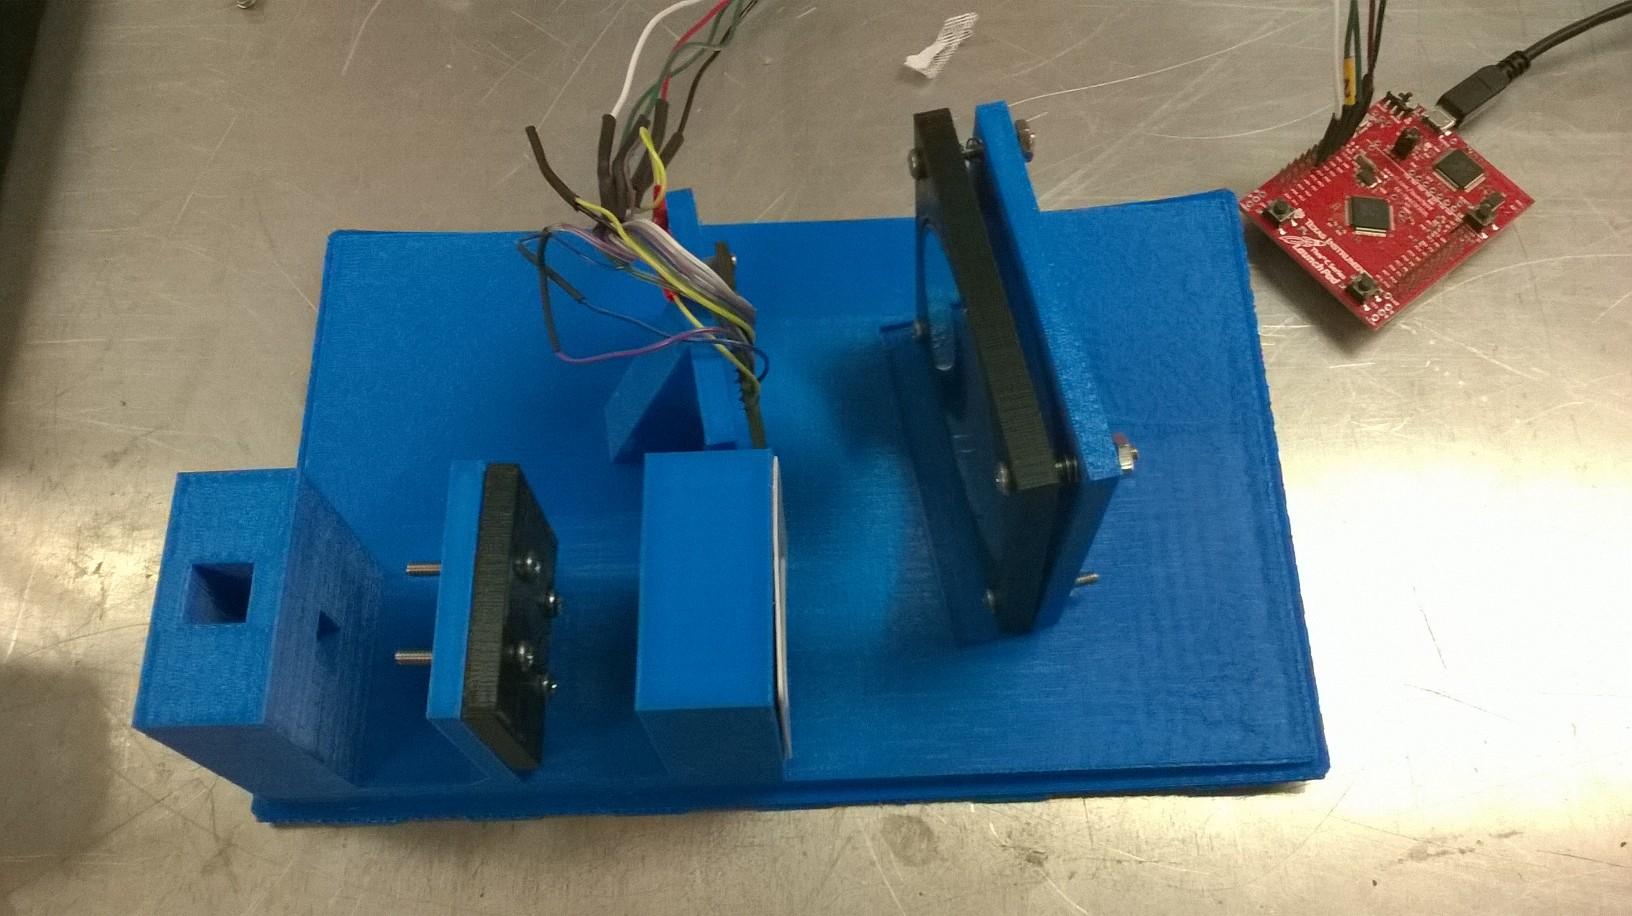 🎈 Public Lab: 3D Printed CCD Spectrometer (WheeTrometer 3 0)